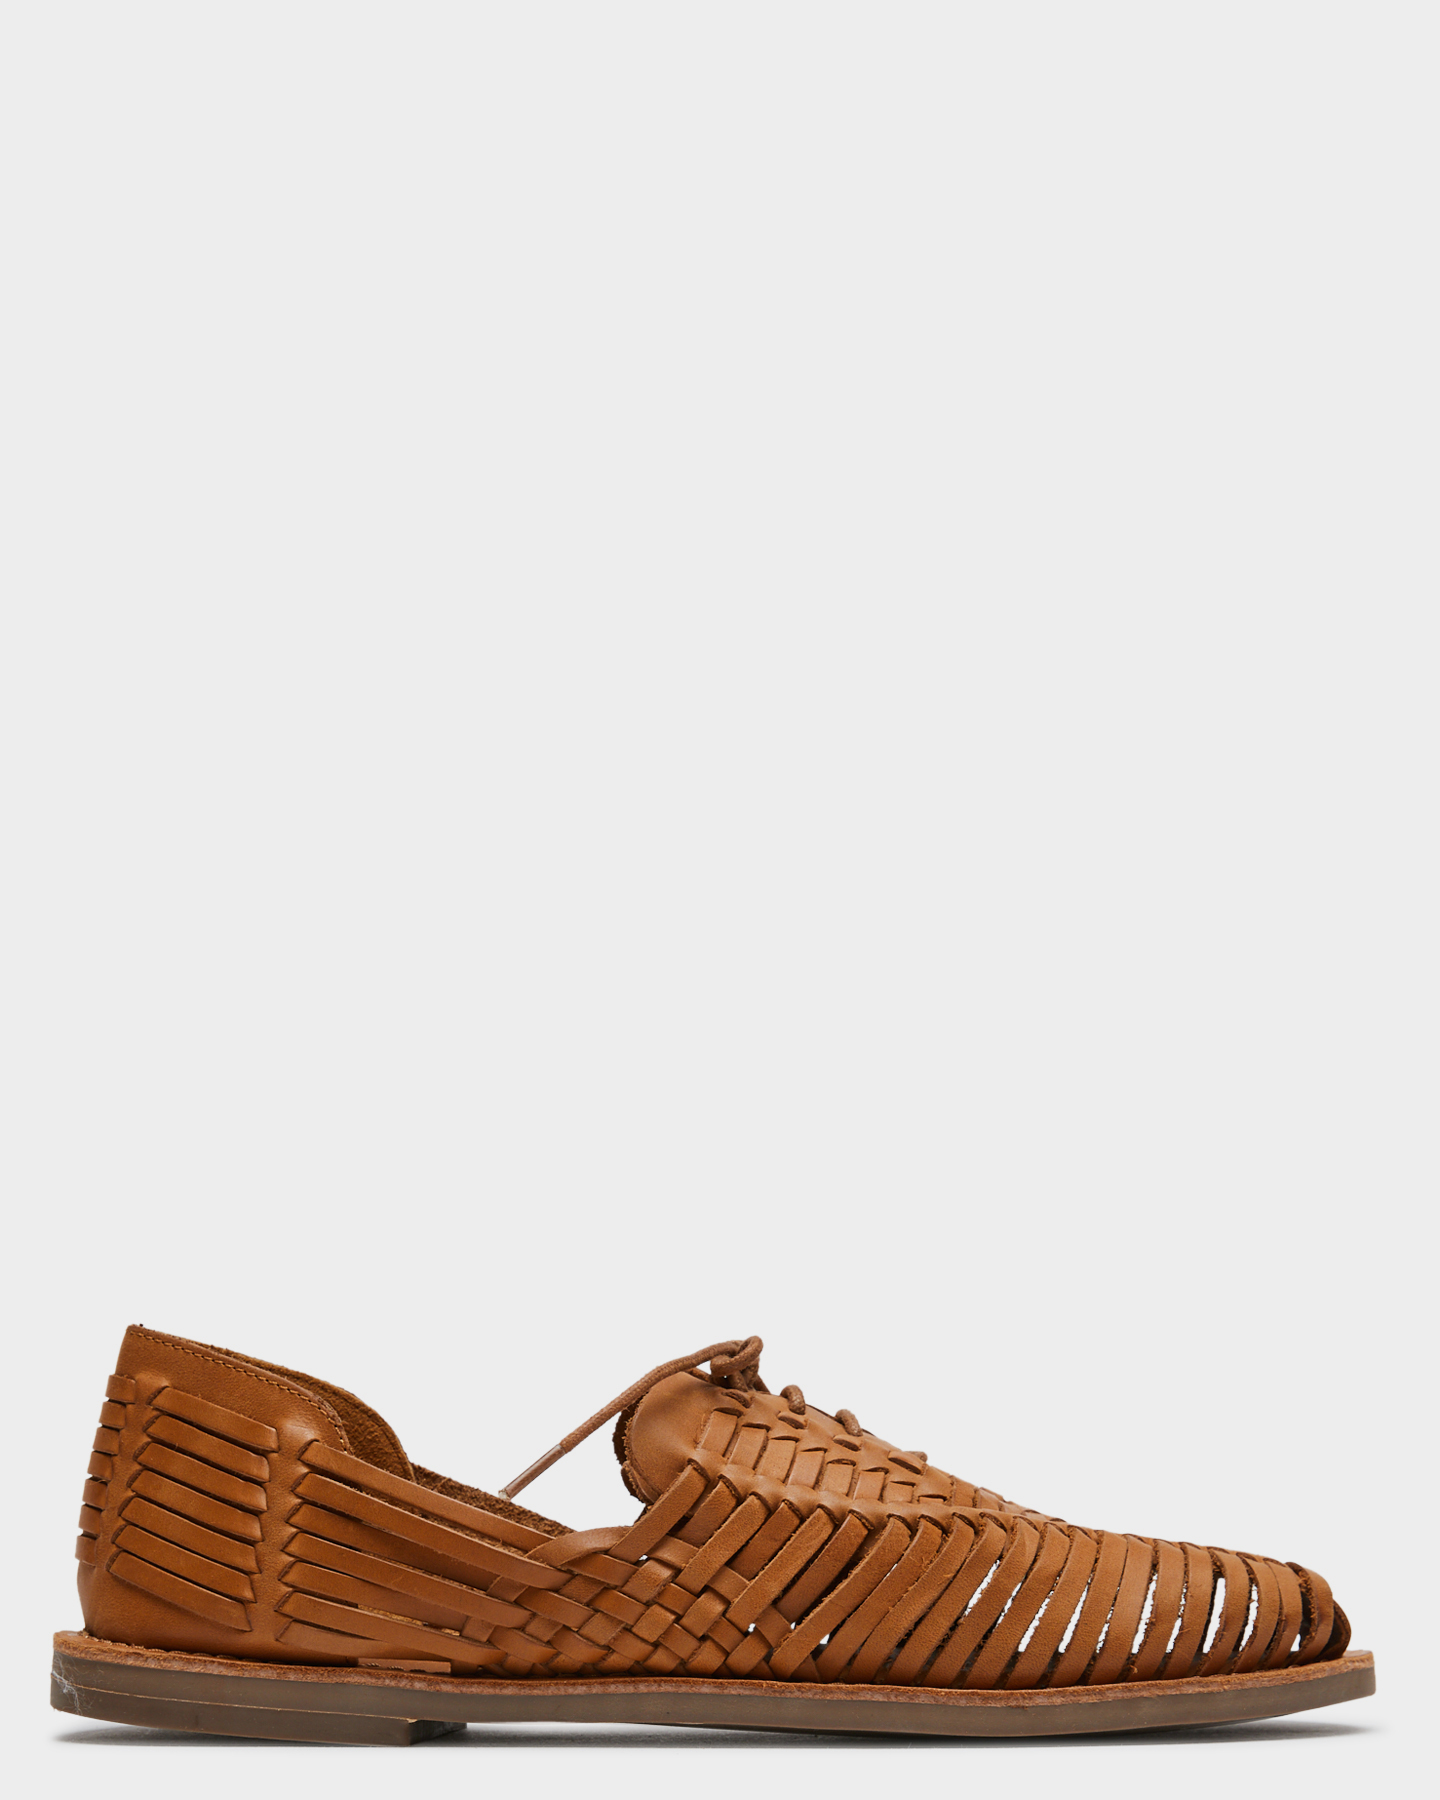 Urge Mykonos Ii Shoe Tan Tan